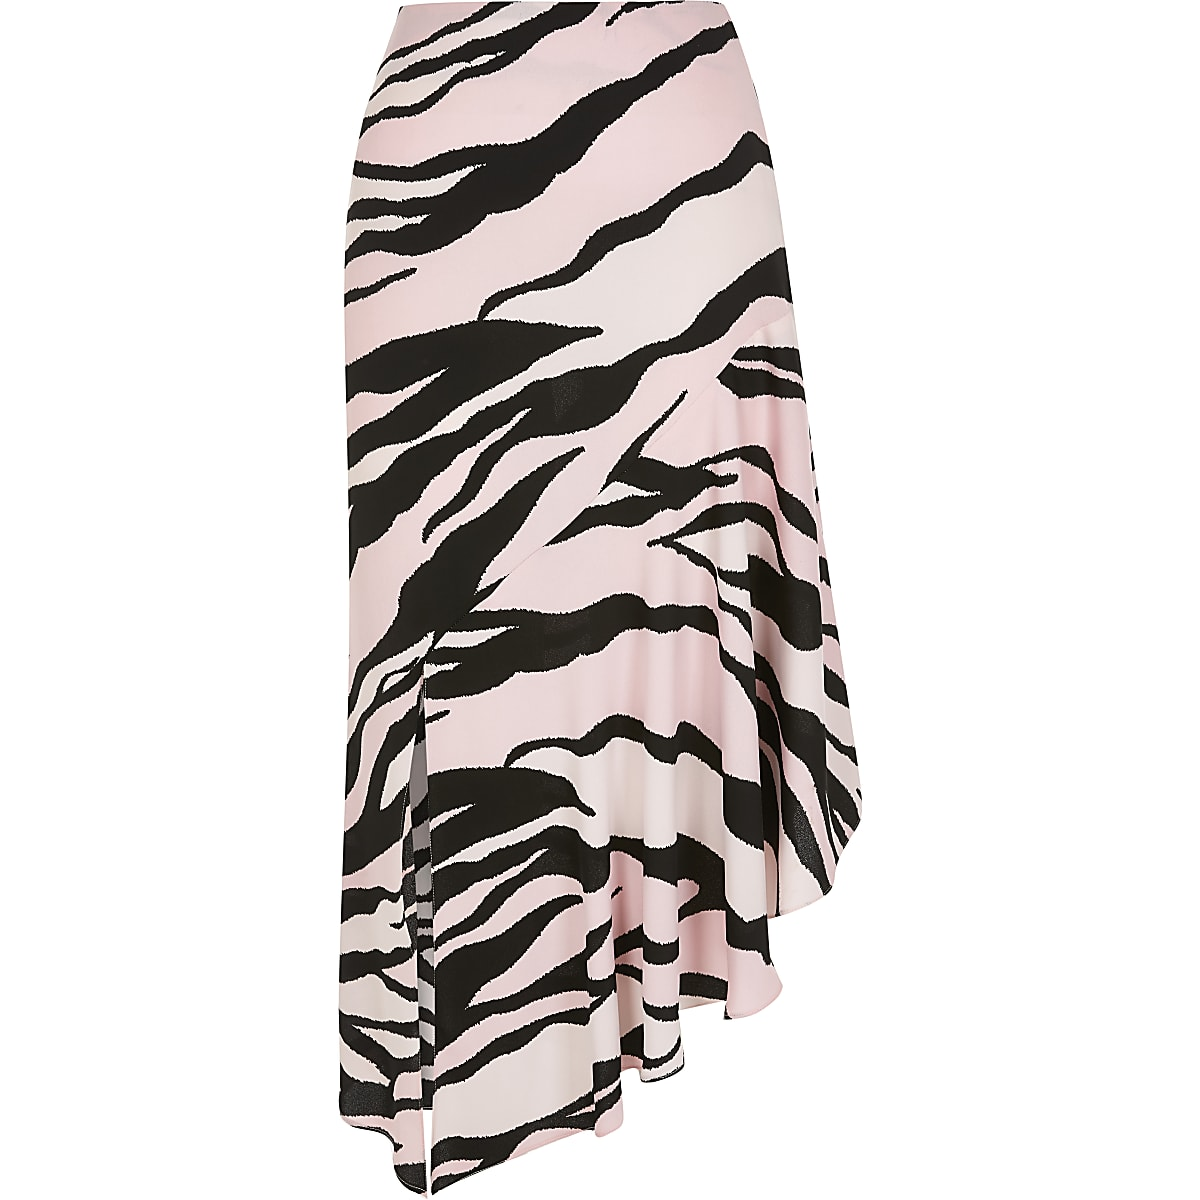 626bf07cb0 Light pink zebra print asymmetric midi skirt - Midi Skirts - Skirts ...